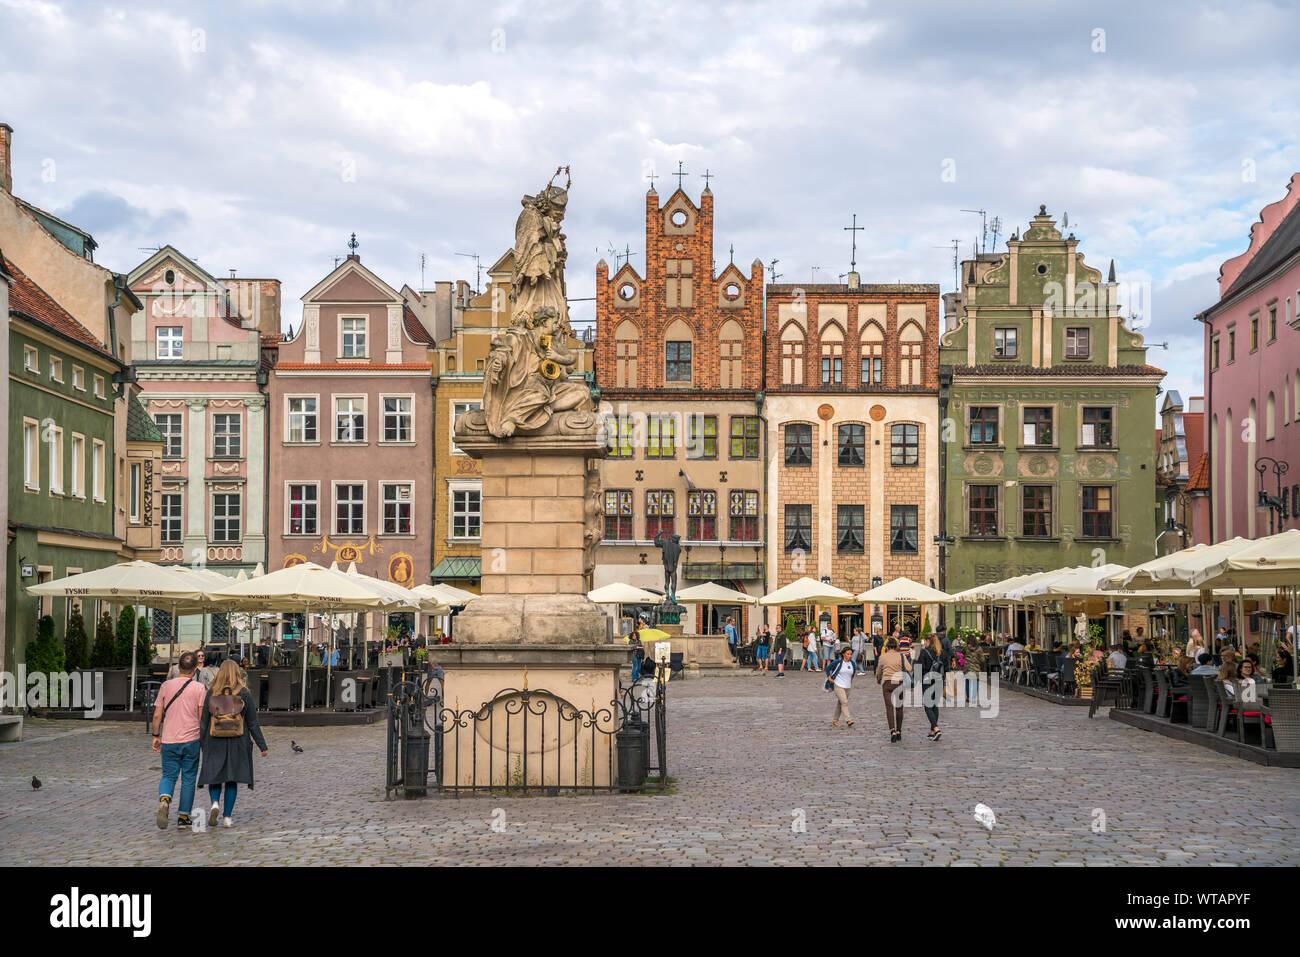 Nepomukstatue und Alter Markt in Posen, Polen, Europa    Nepomuk statue  on the Old marketplace,  Poznan, Poland, Europe Stock Photo